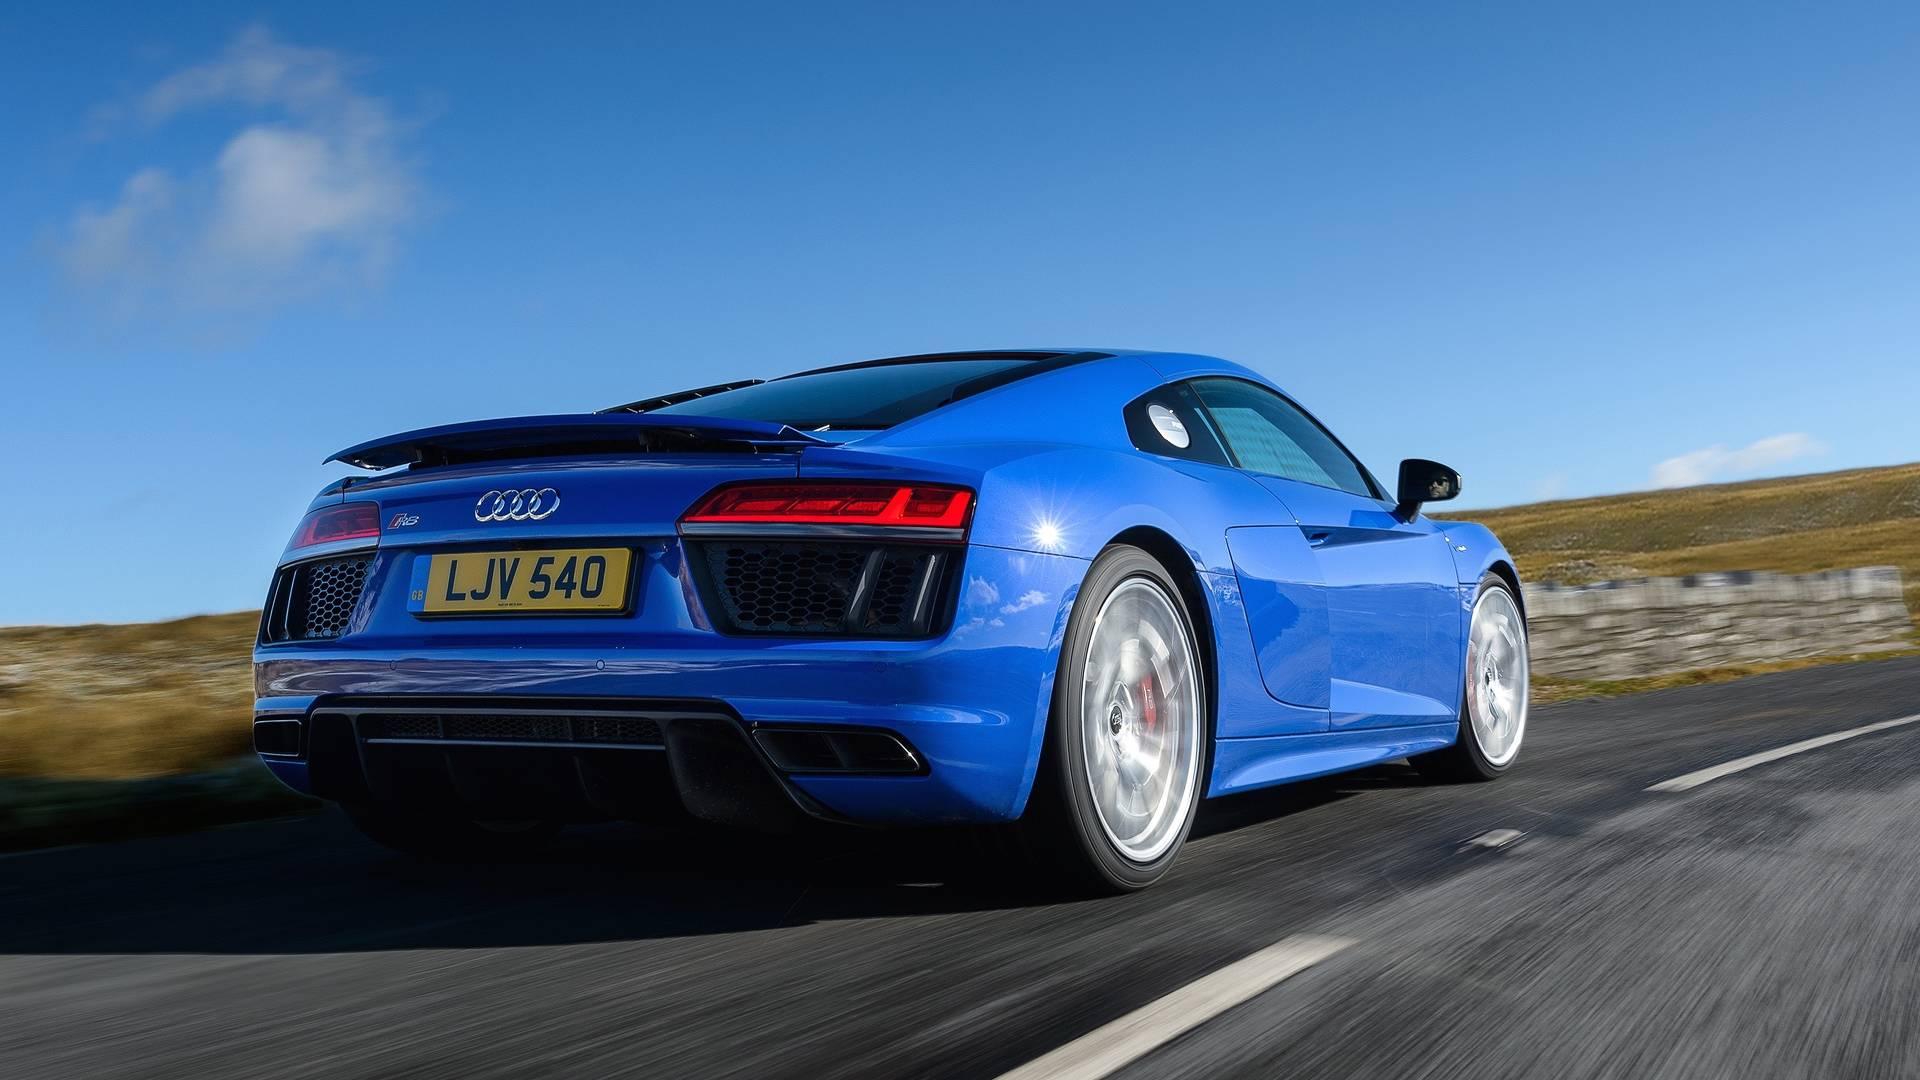 Audi S Tail Happy R8 V10 Rws Visits Jay Leno S Garage